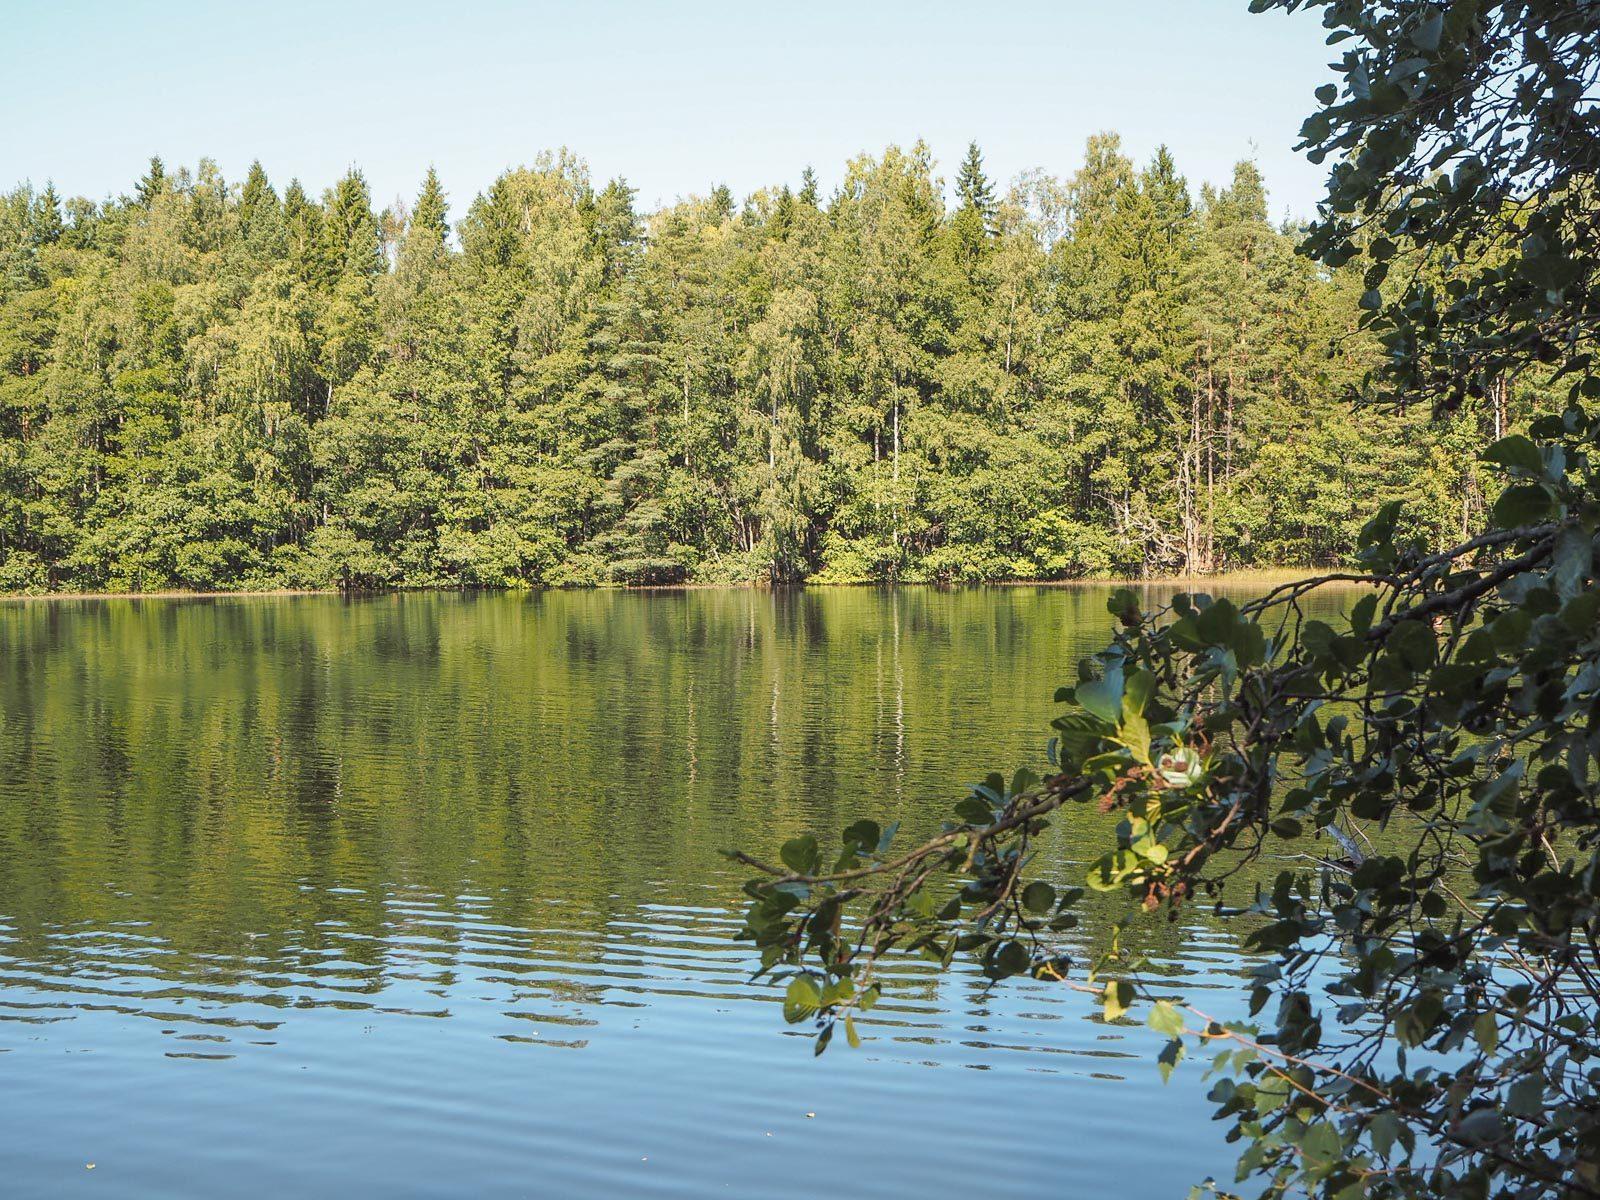 Pentalan järvi